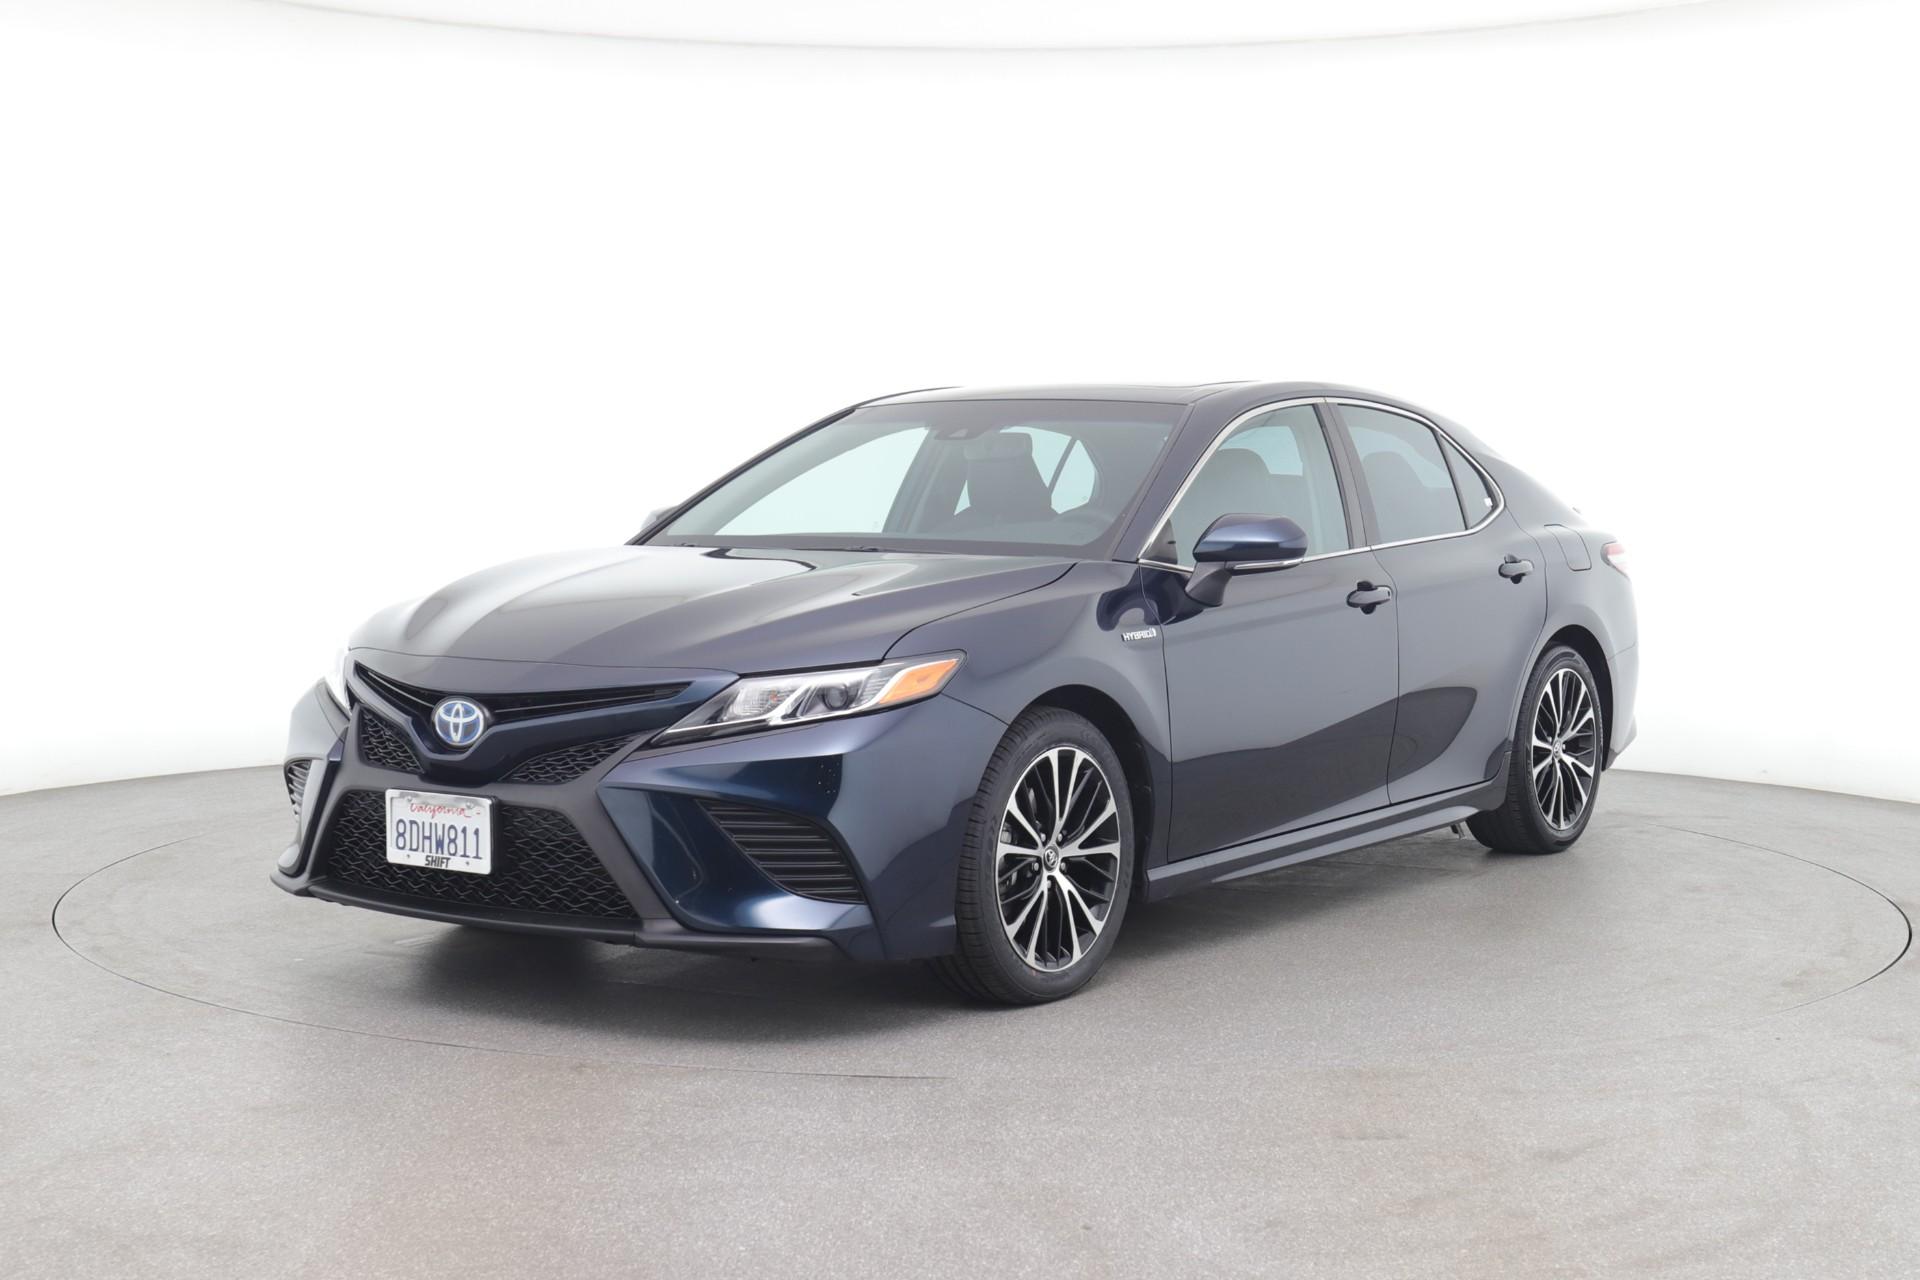 Best Used Hybrid Cars to Buy in 2021